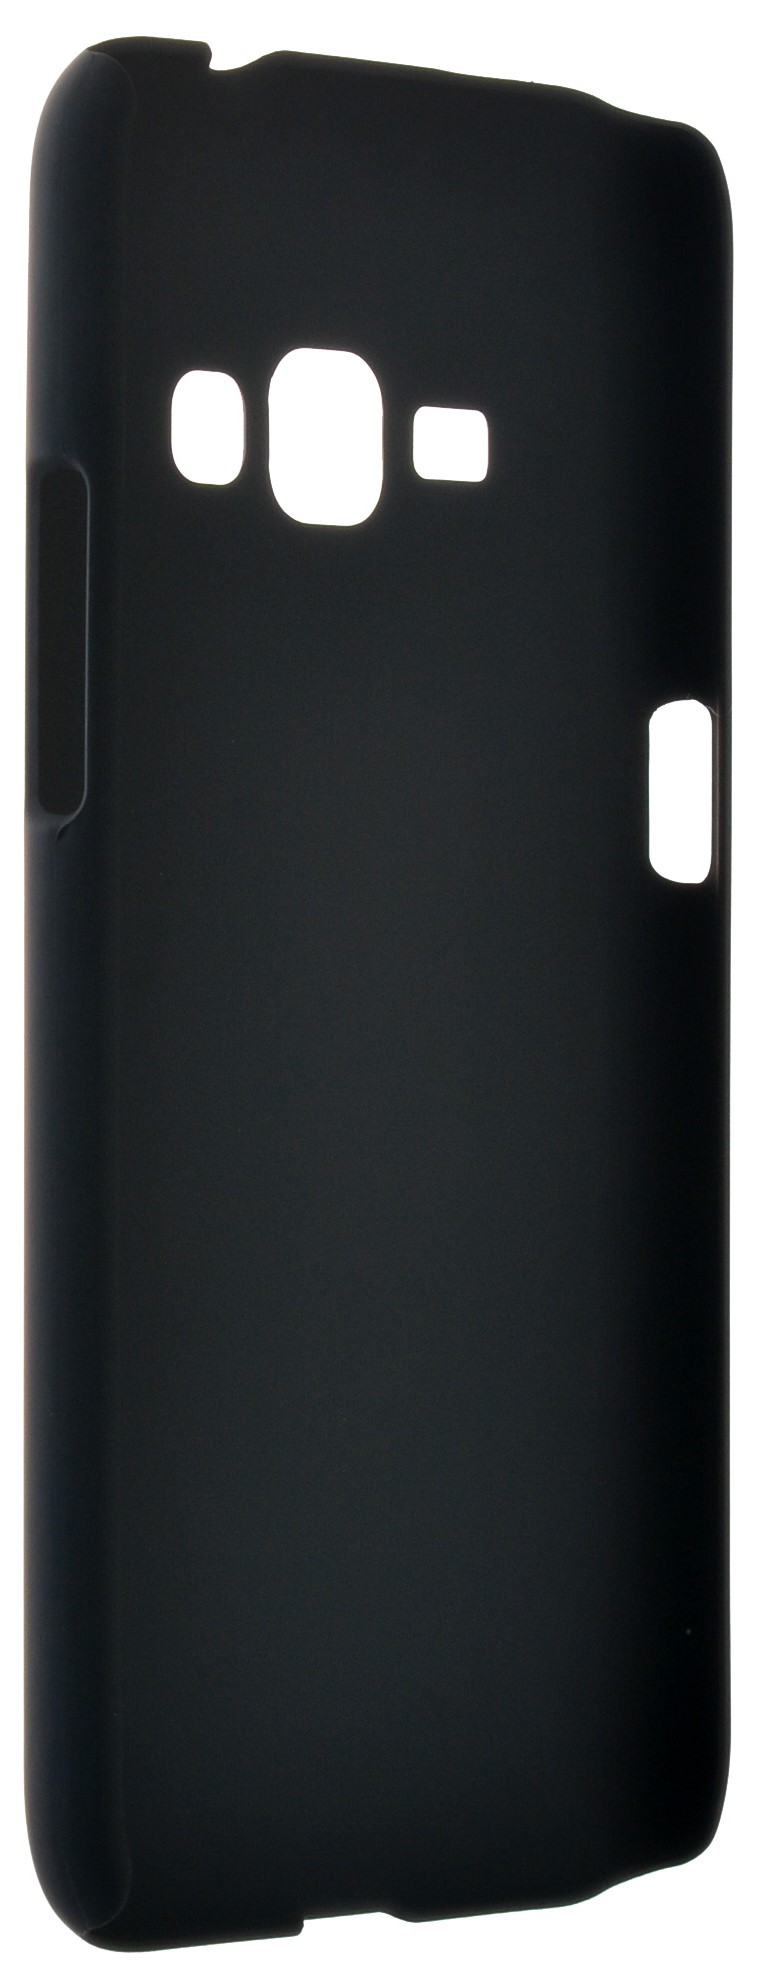 Чехол skinBOX 4People case для Samsung Galaxy J1 (2016) SM-J120F/DS, черный